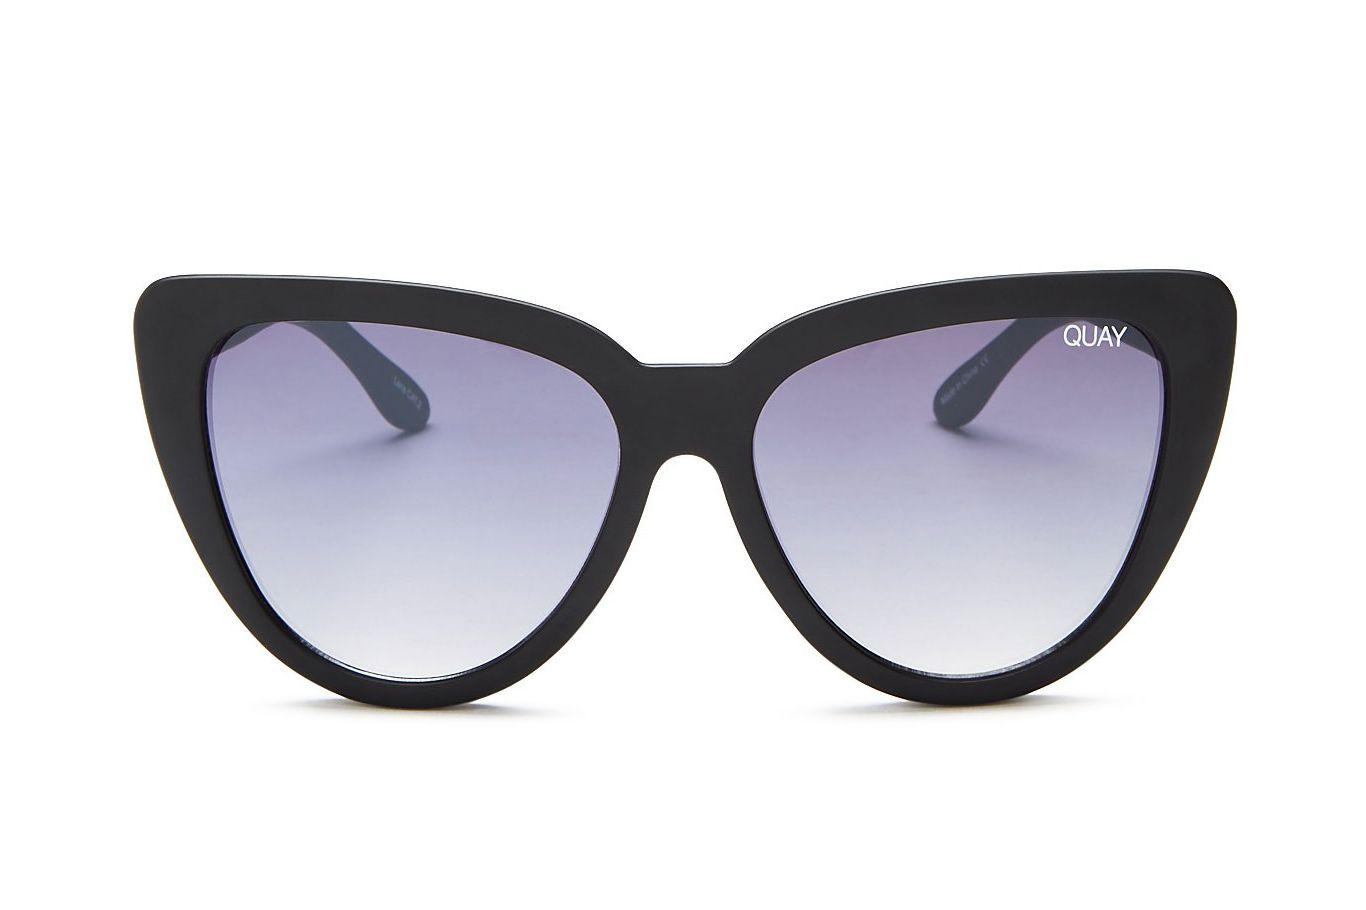 Quay Stray Cat Oversized Cat Eye Sunglasses